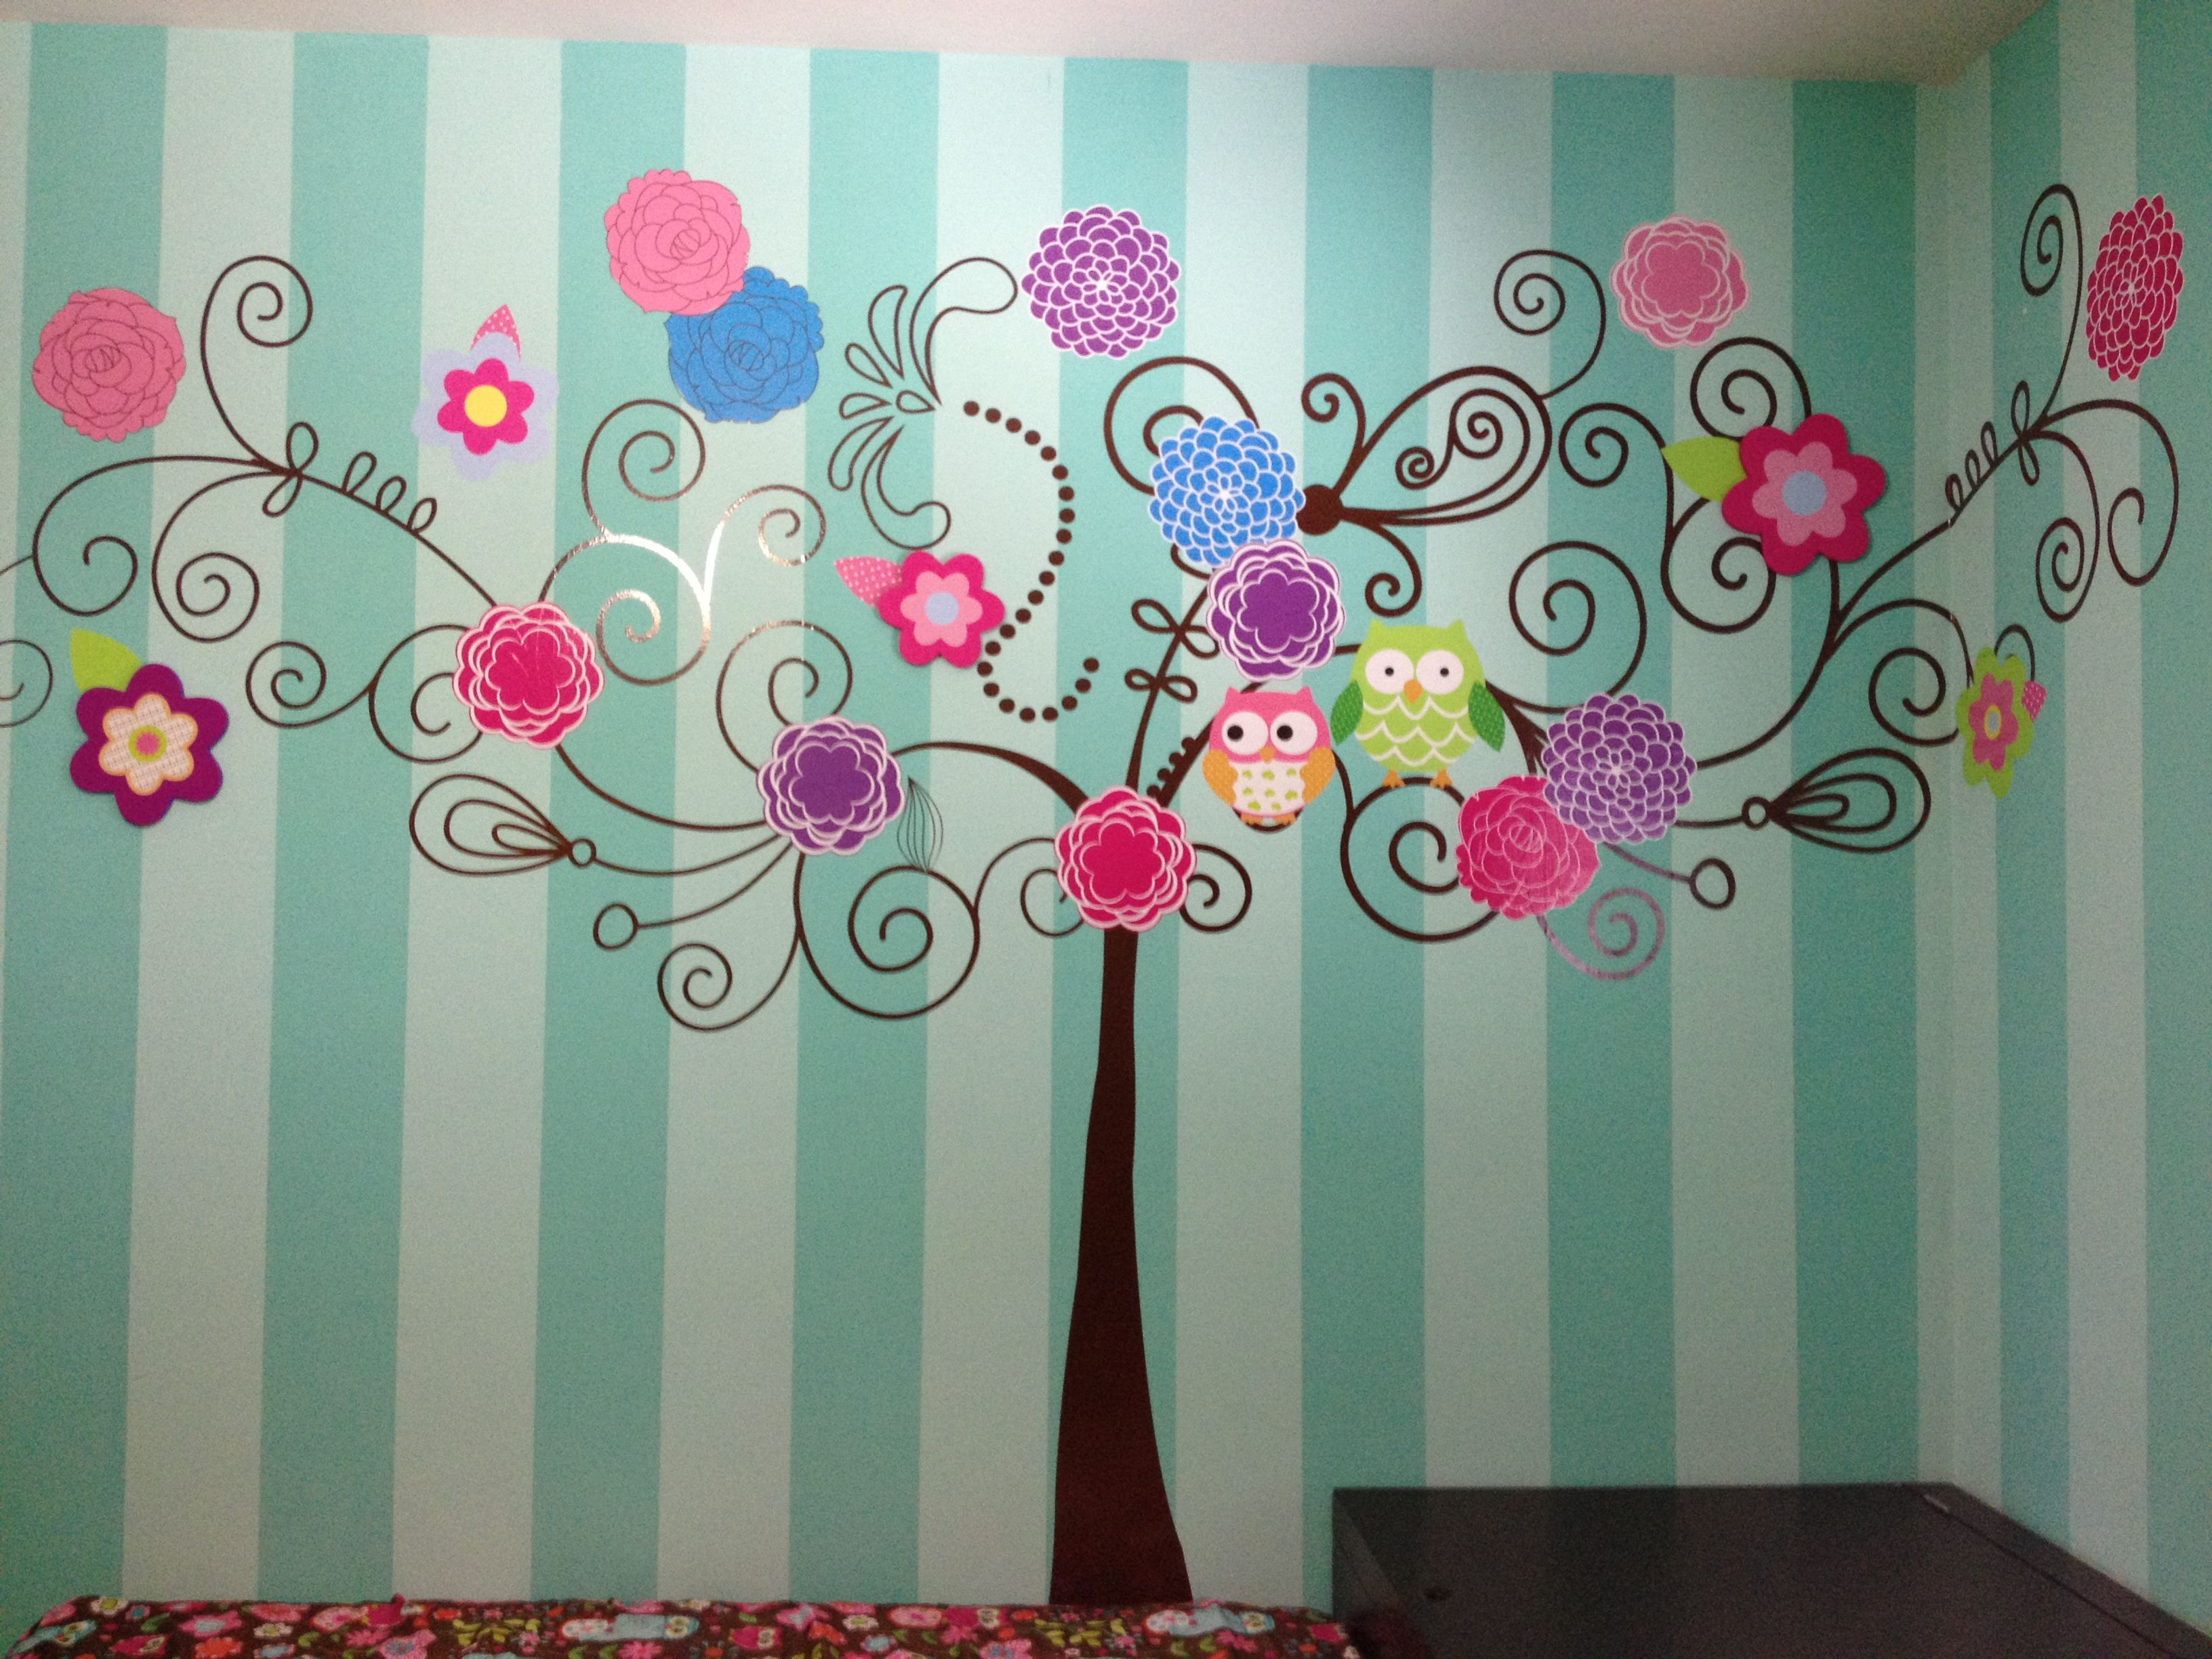 Vinil decorativo con flores de madera decoradas dise os - Madera para decorar ...